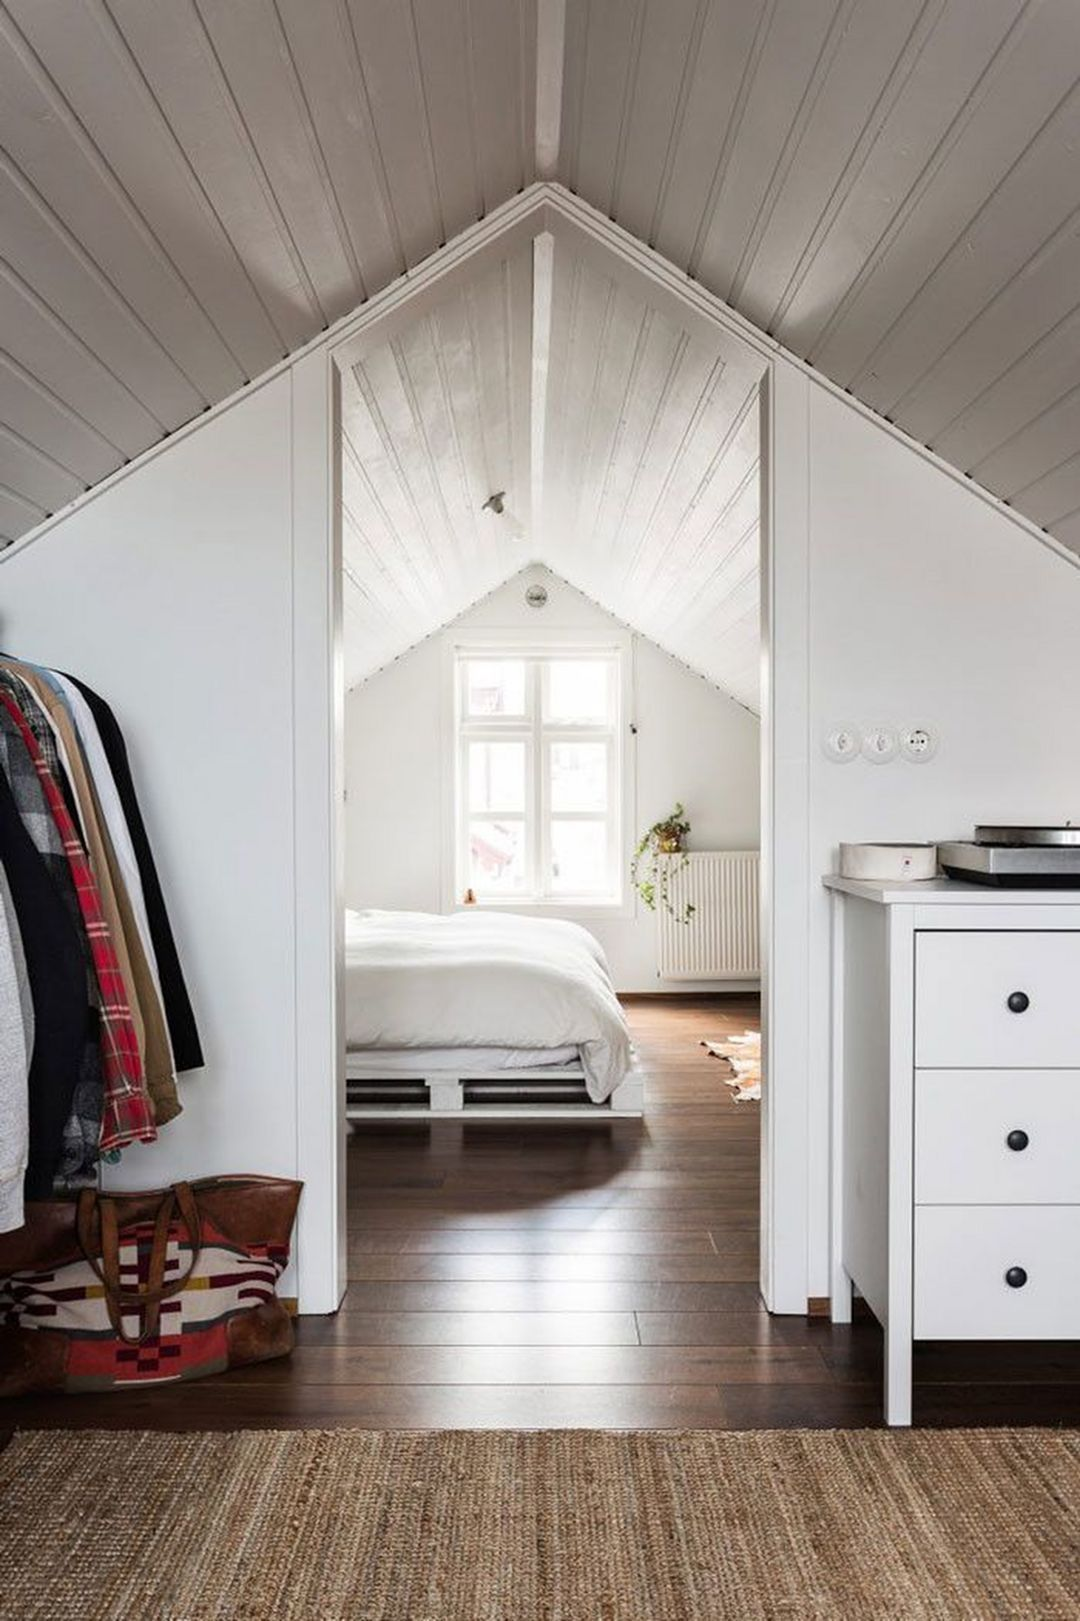 25 Amazing And Beautiful Loft Bedroom Design Ideas For Best Inspiration Goodsgn Attic Bedroom Small Attic Bedroom Designs Attic Master Bedroom